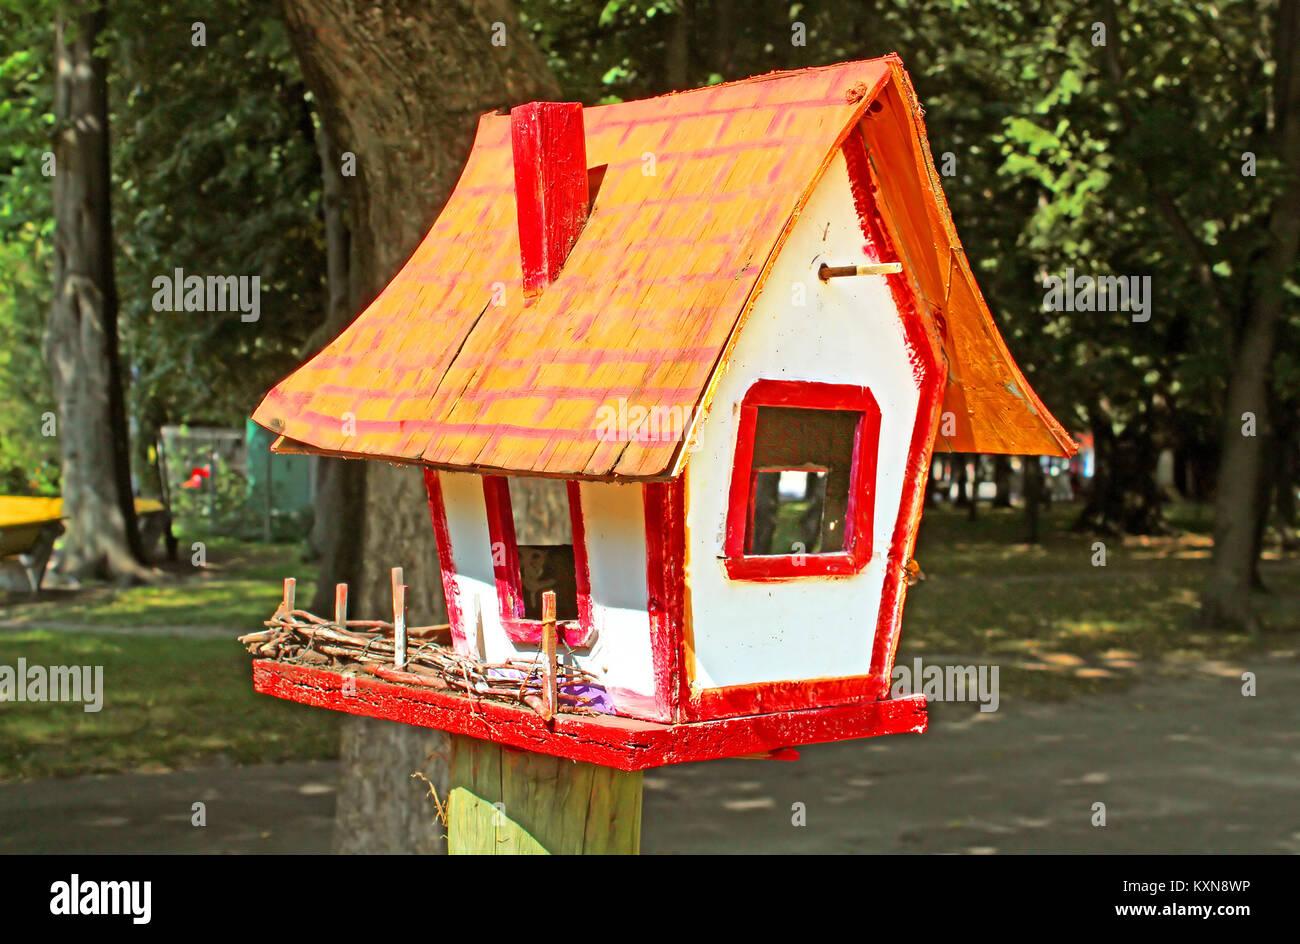 Birdhouse at park - Stock Image